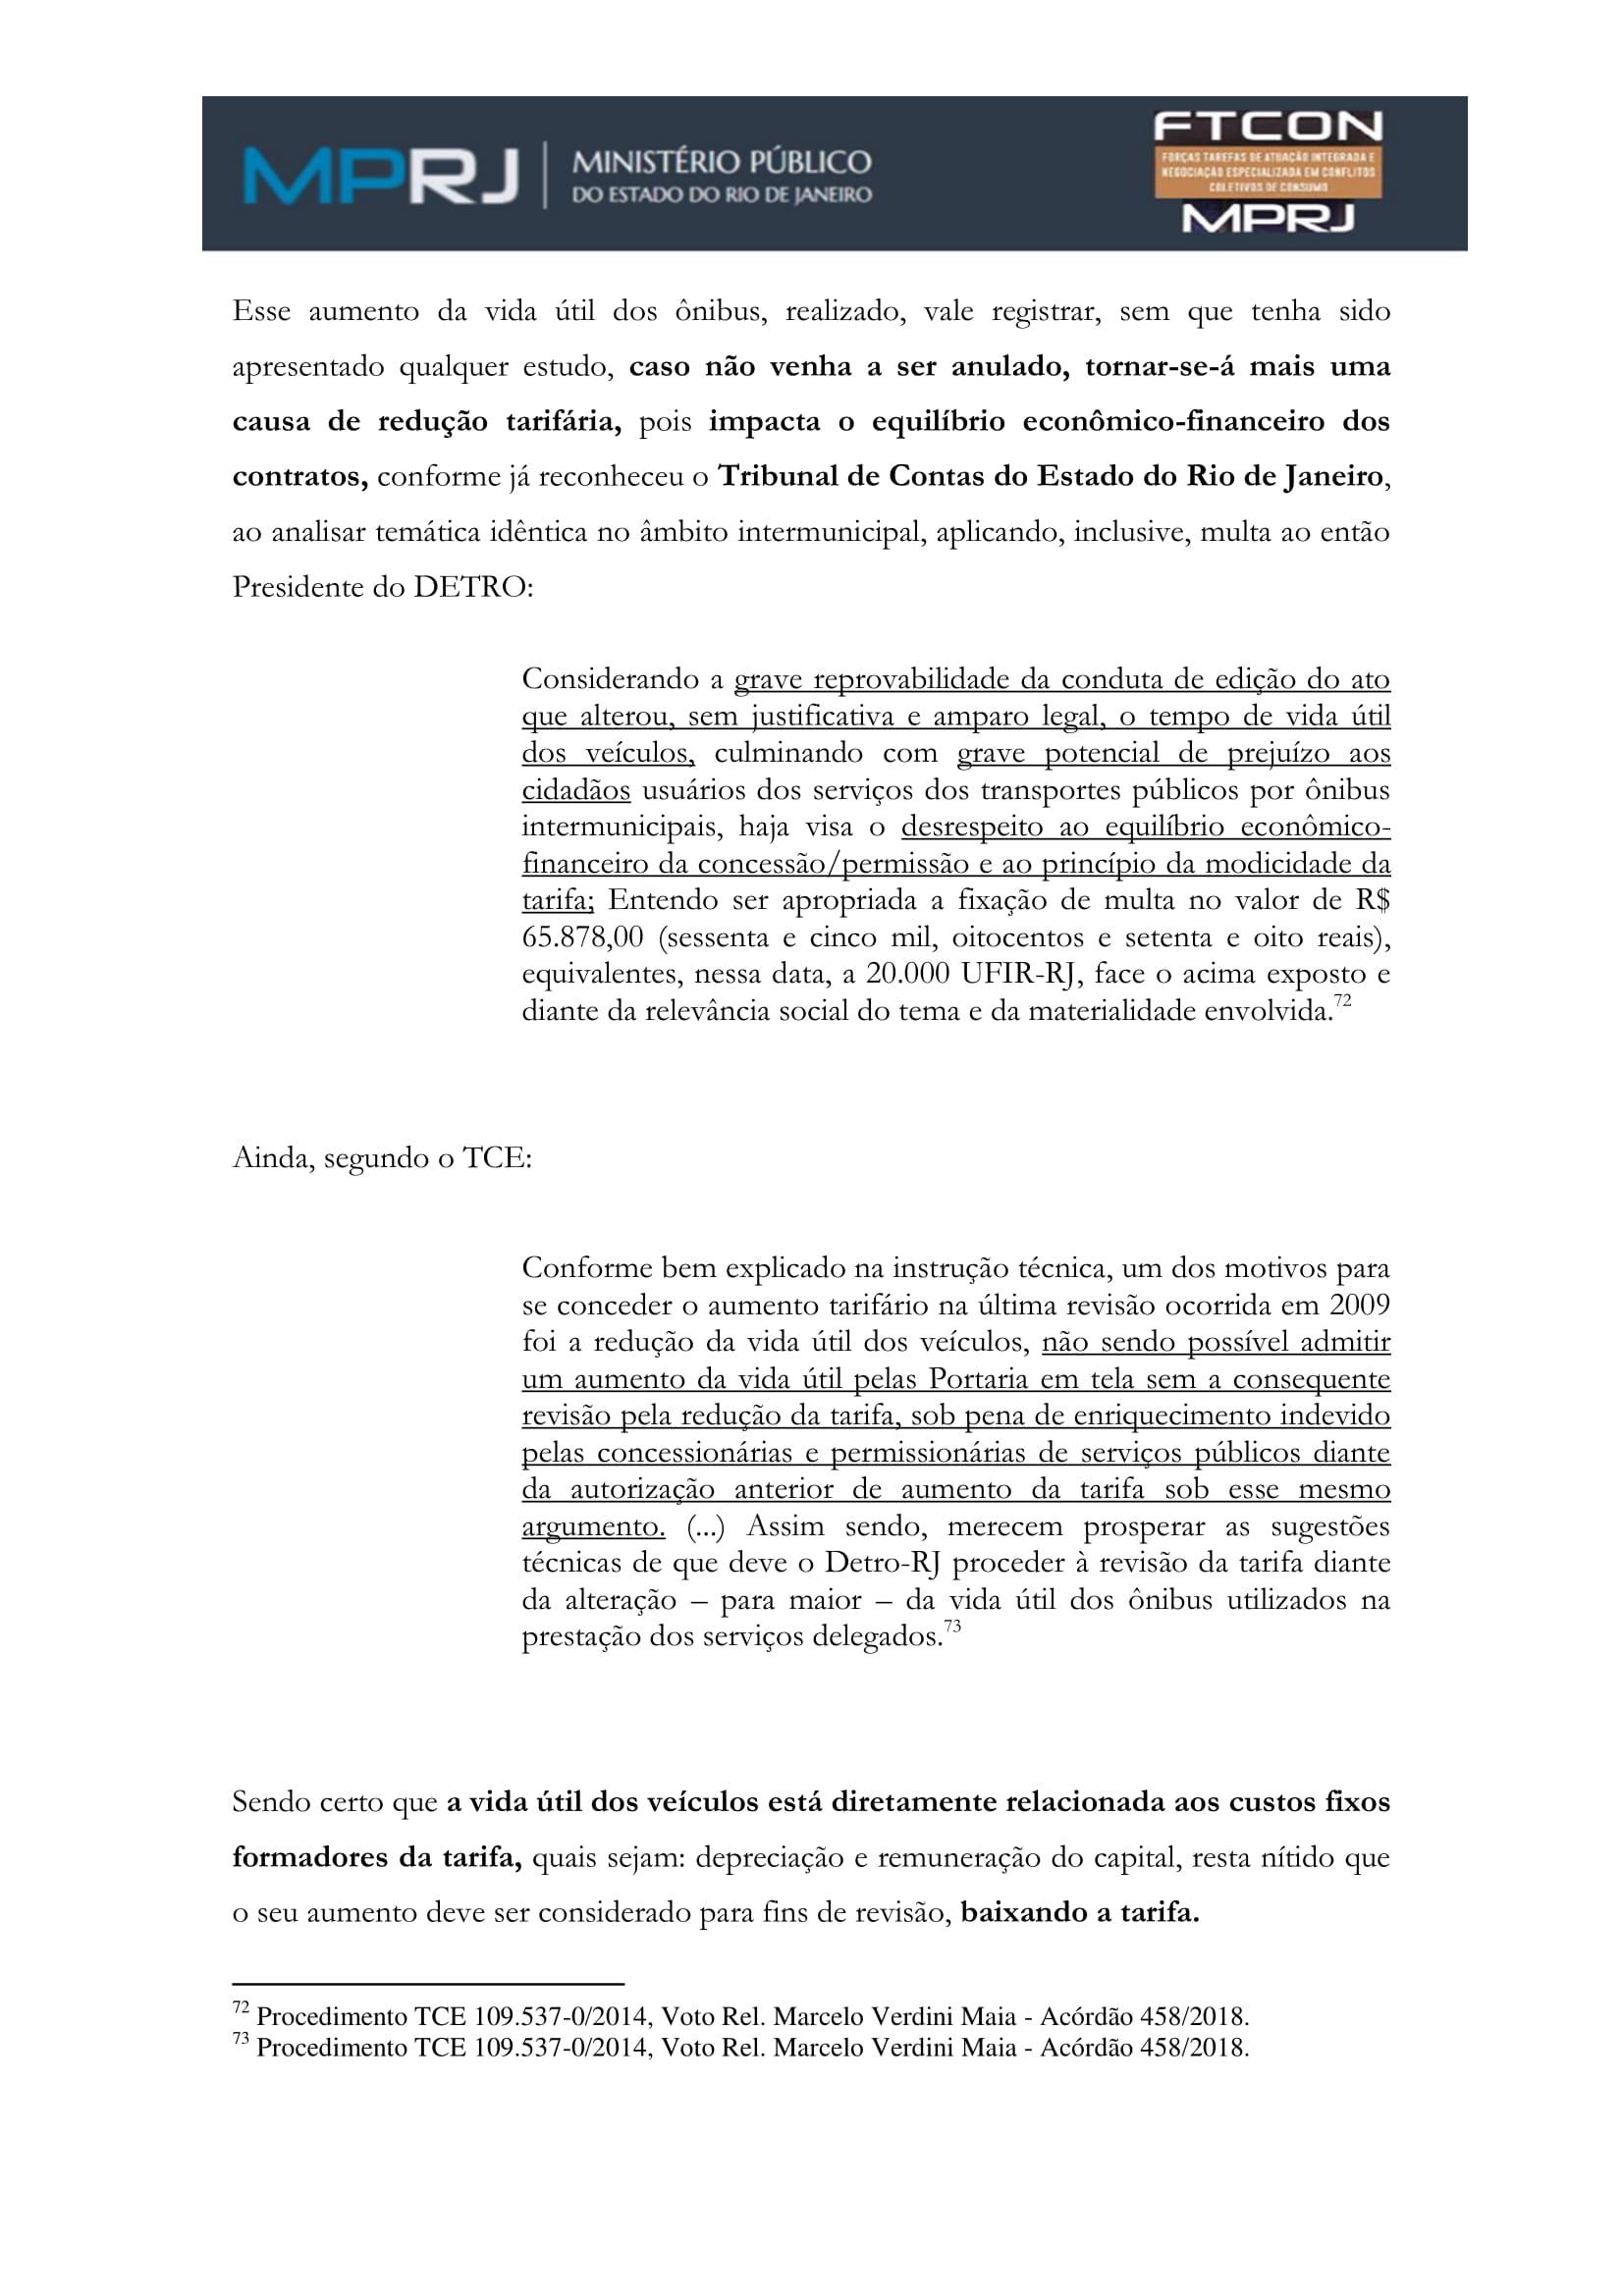 acp_caducidade_onibus_dr_rt-082